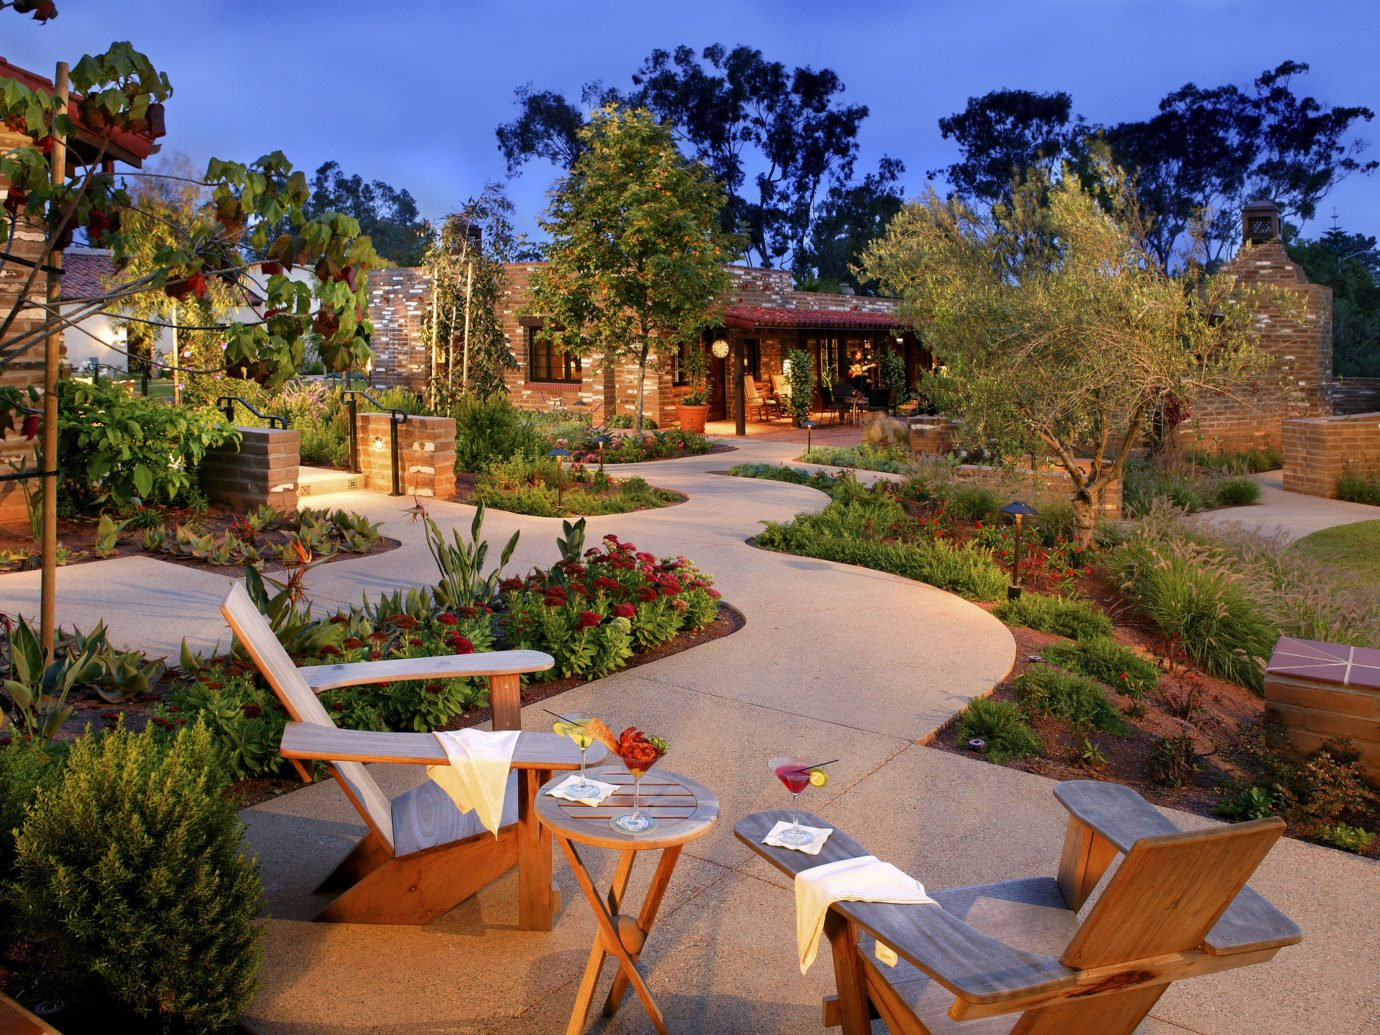 La Jolla Hotels - Estancia Hotel And Spa - San Diego